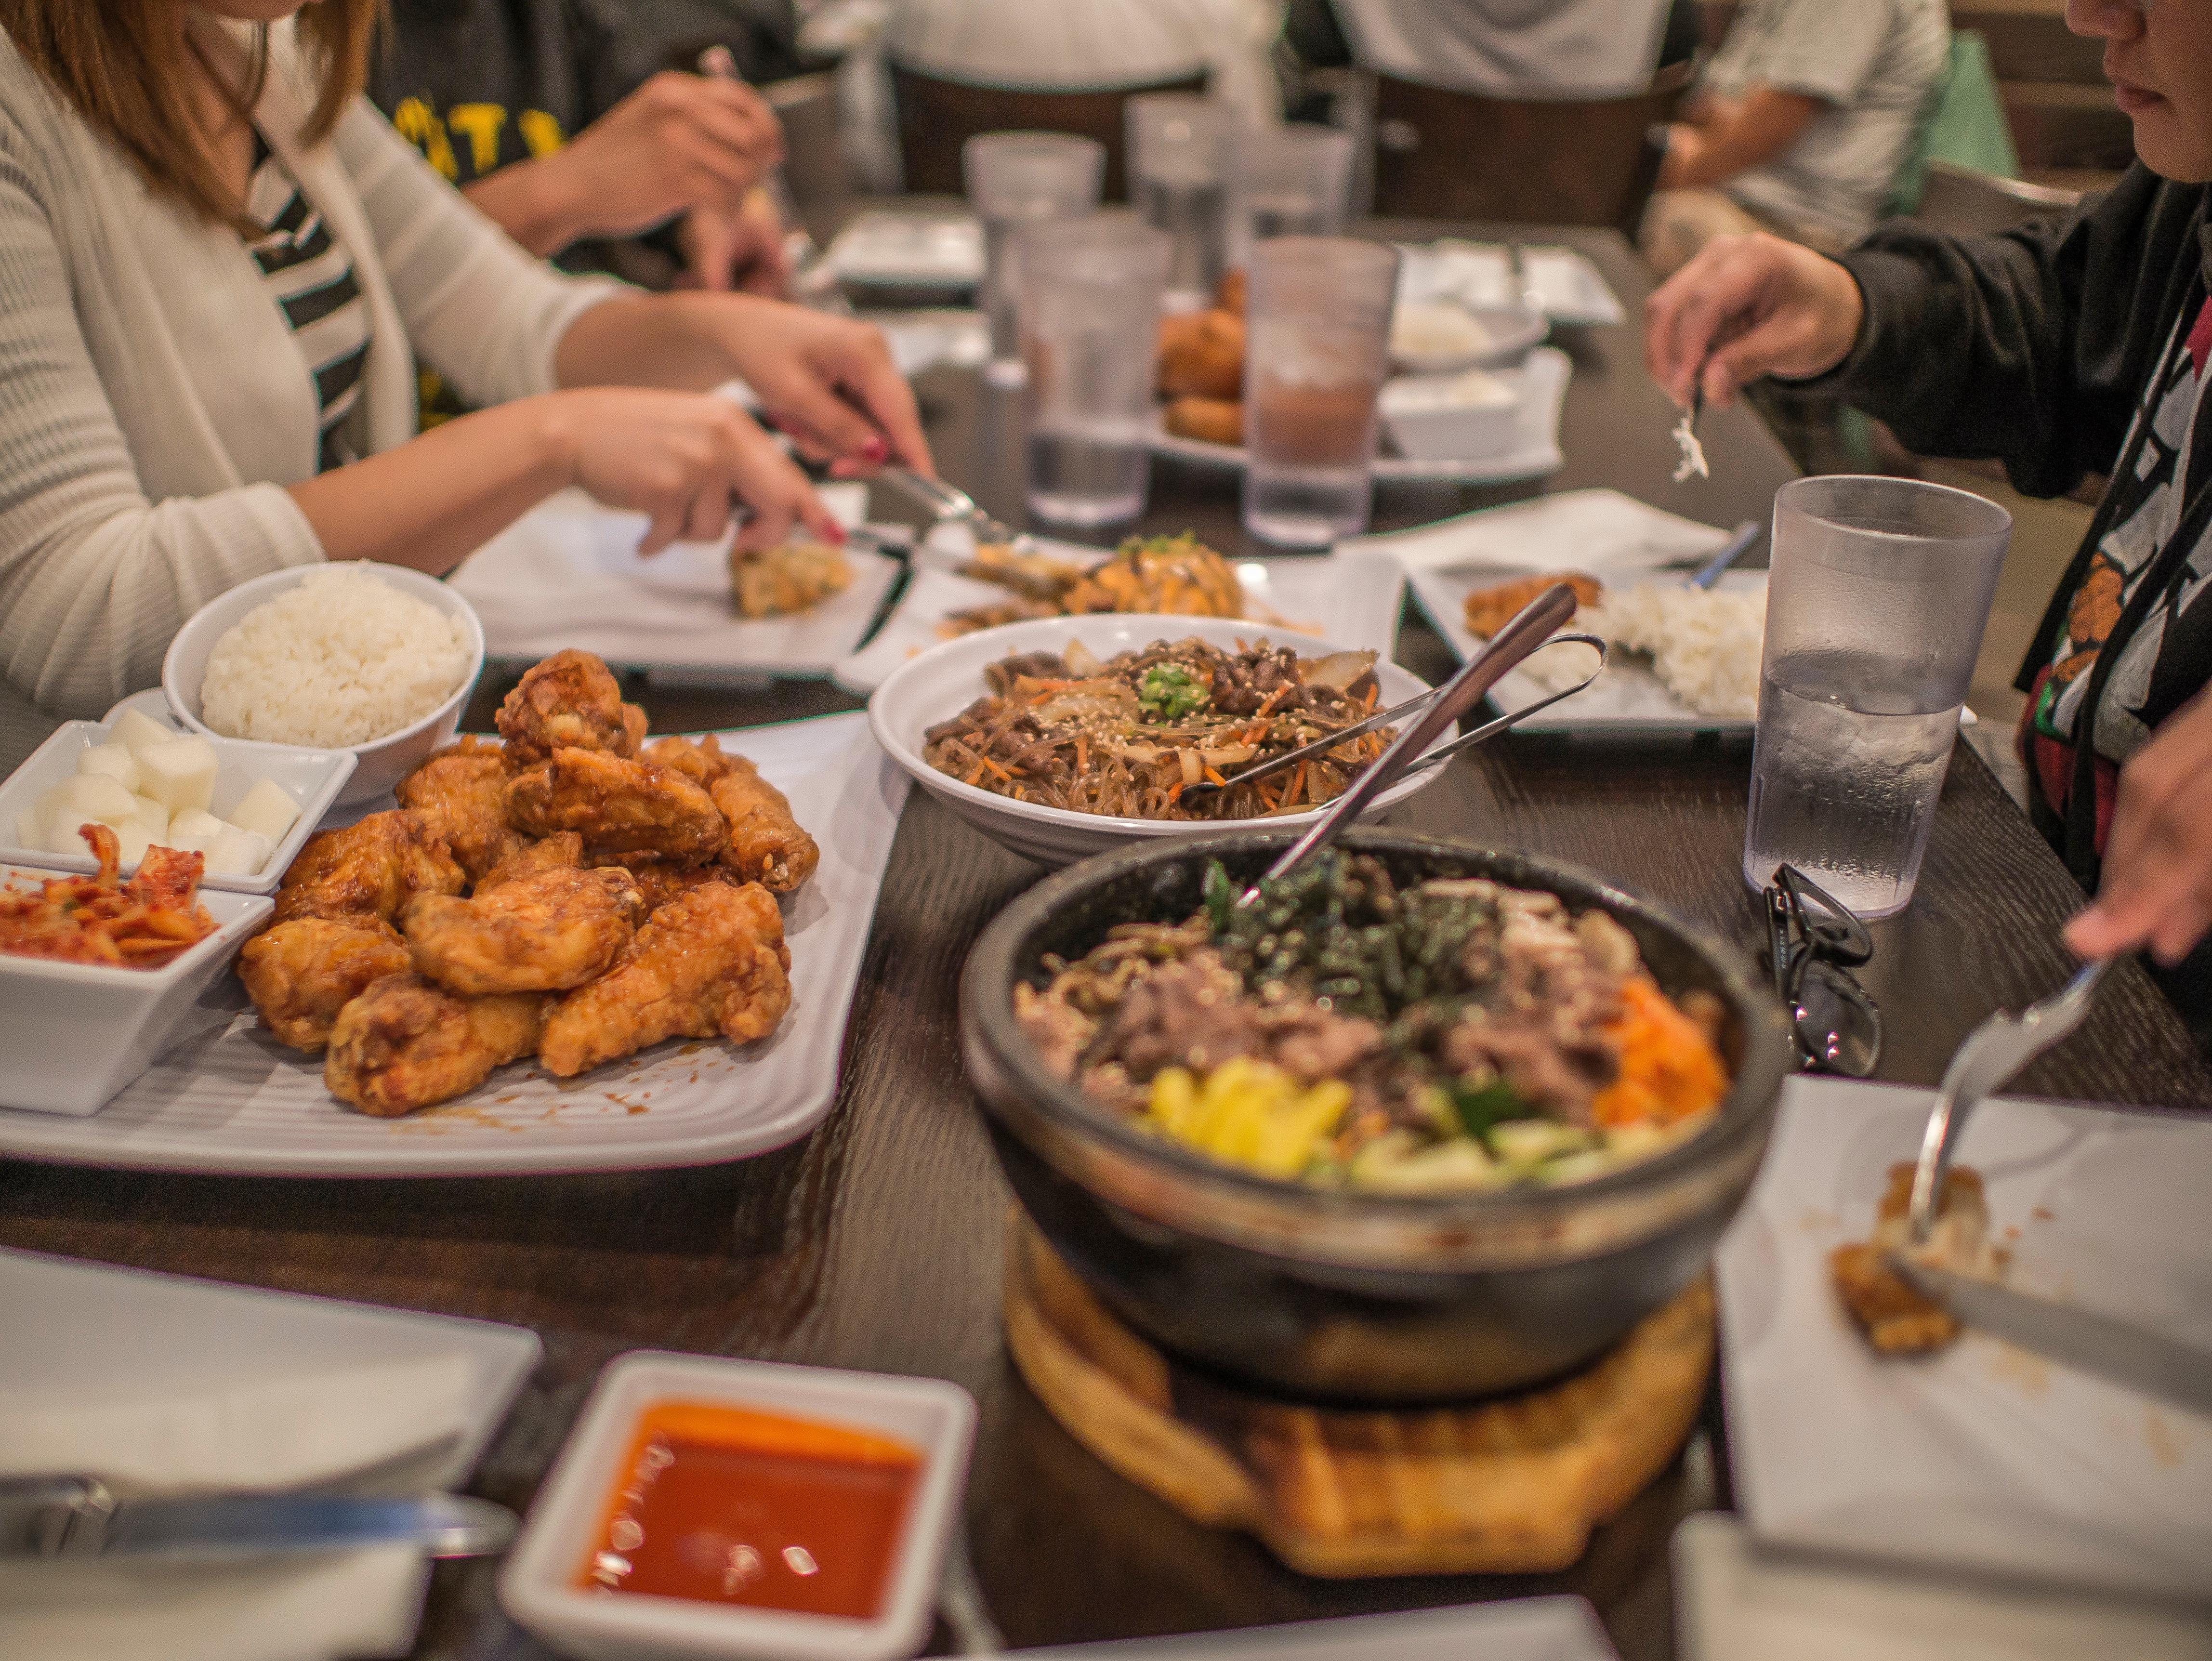 Gambar Restoran Hidangan Makan Siang Masakan Prasmanan